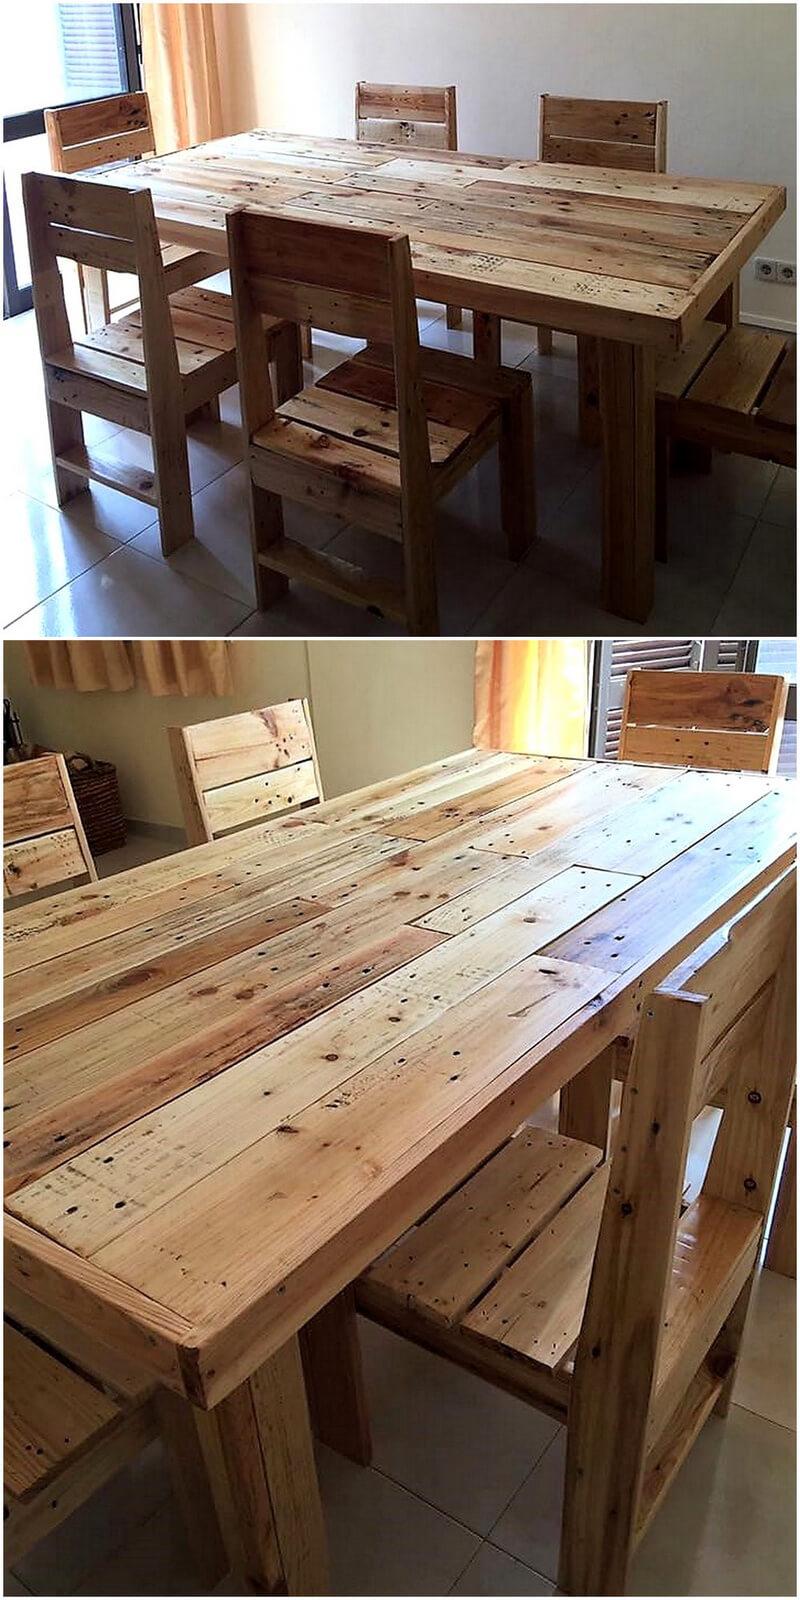 Creative Ideas For Your Next Wood Pallet Project Pallet Ideas # Muebles Reiclados